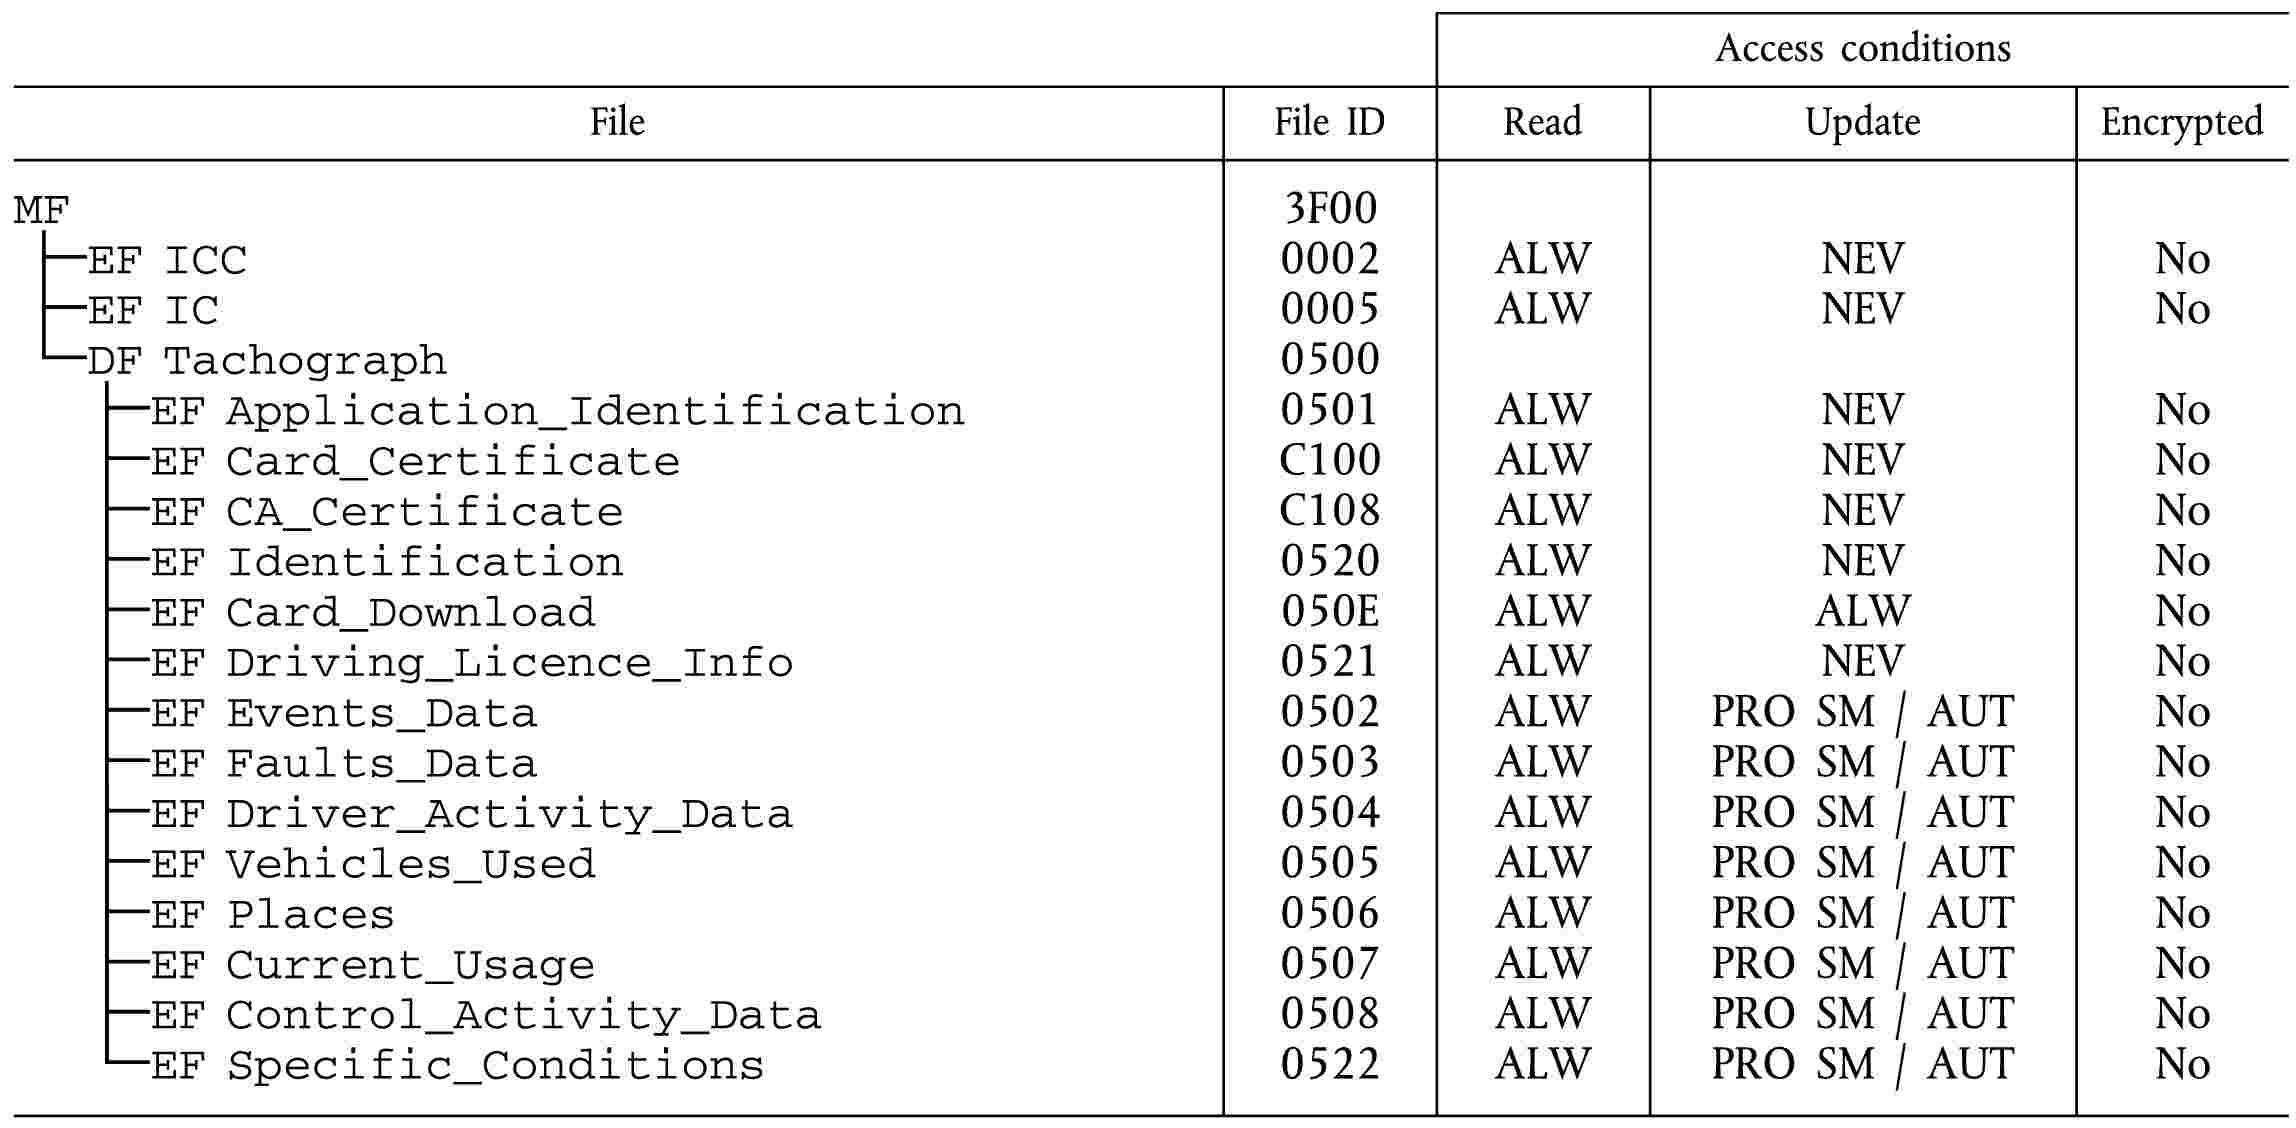 worksheet Heating Curve Worksheet Answers sfp heating curves worksheet answers printable blog eur lex 01985r3821 20141101 en answers